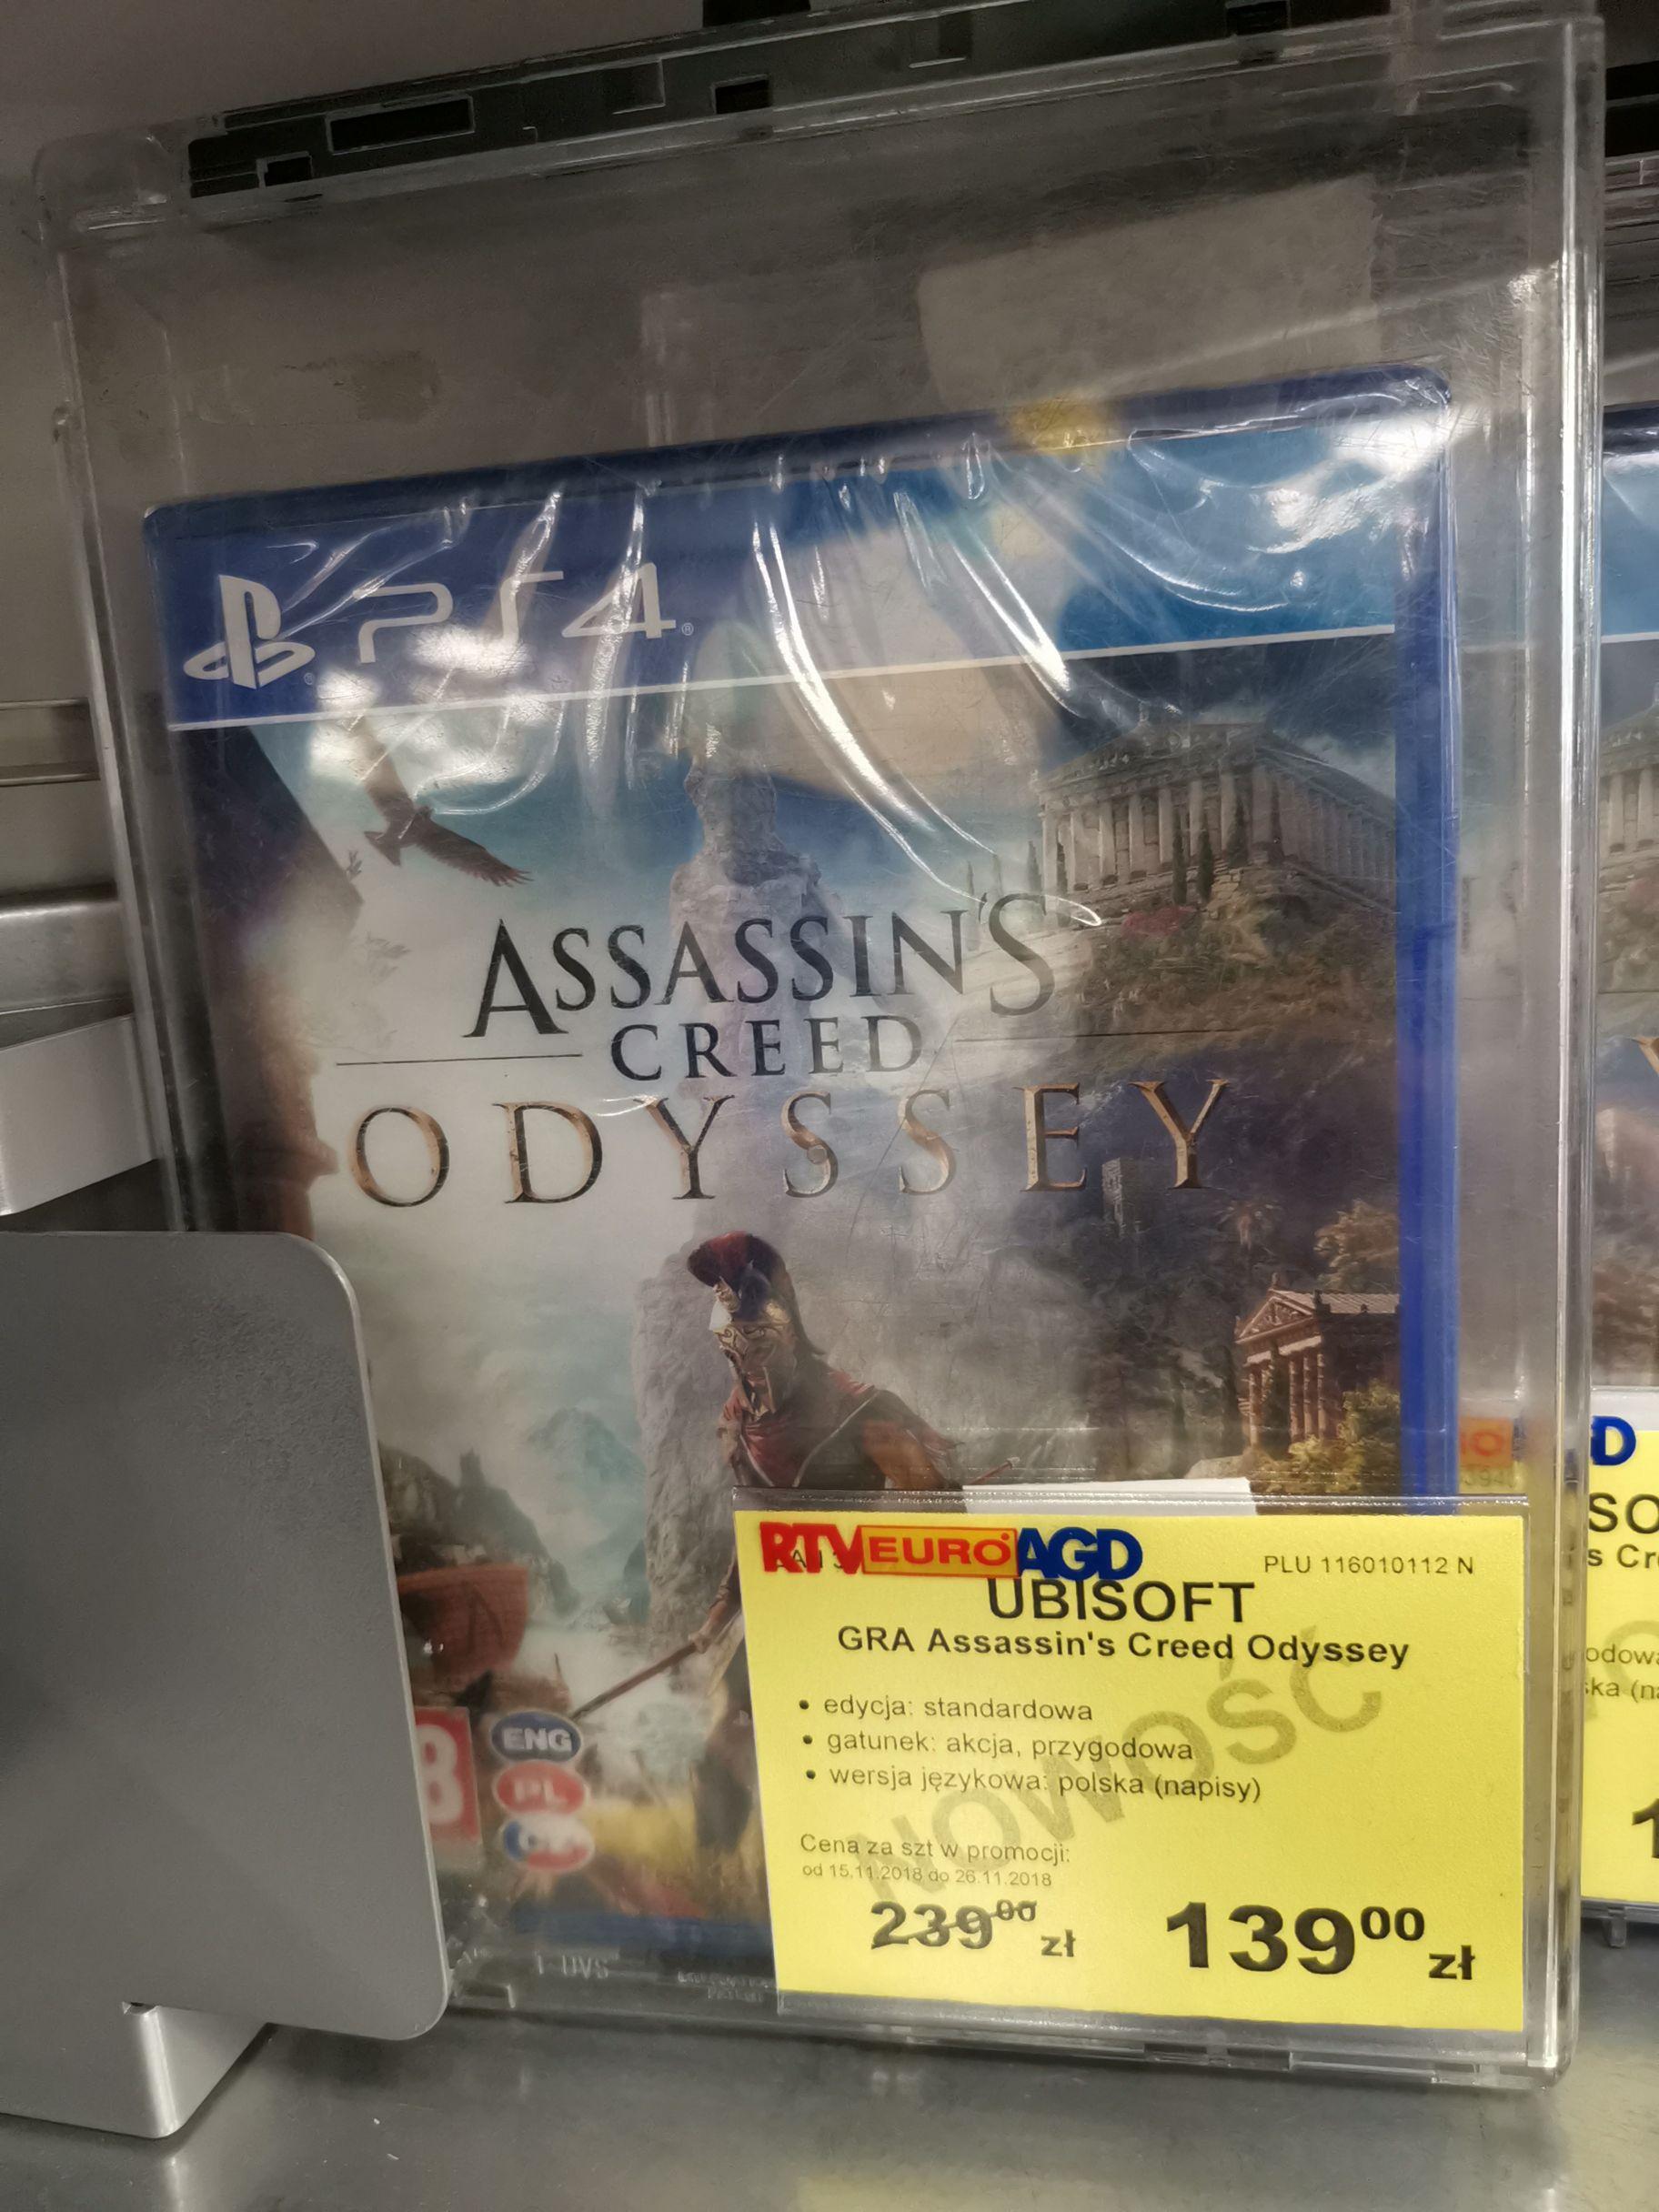 Assasins Creed Odyssey PS4 RtvEuroAgd